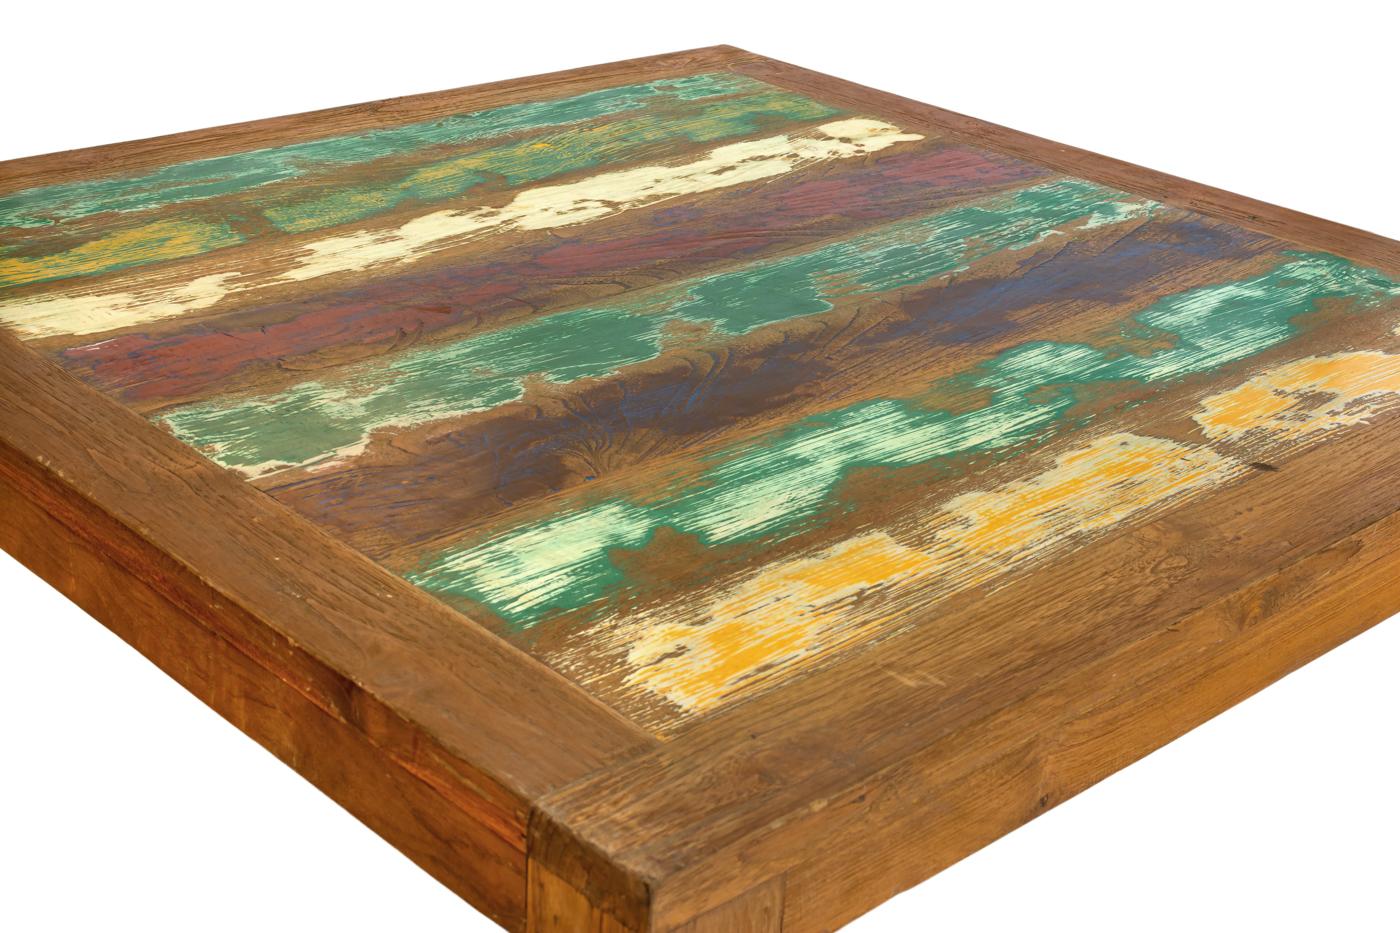 Mesa de centro en madera teka con franjas de colores